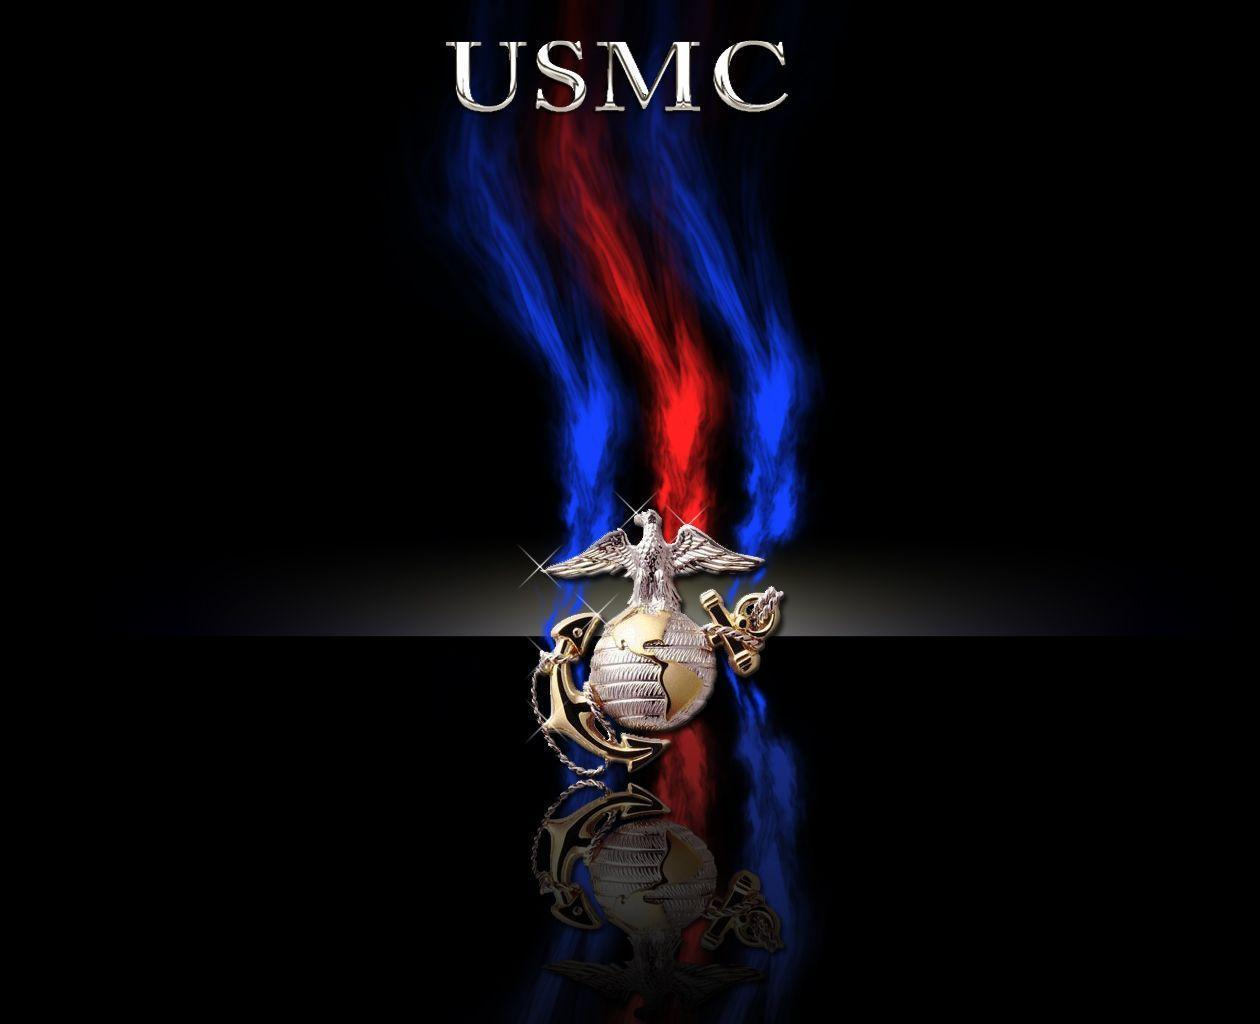 USMC Desktop Backgrounds 1260x1024